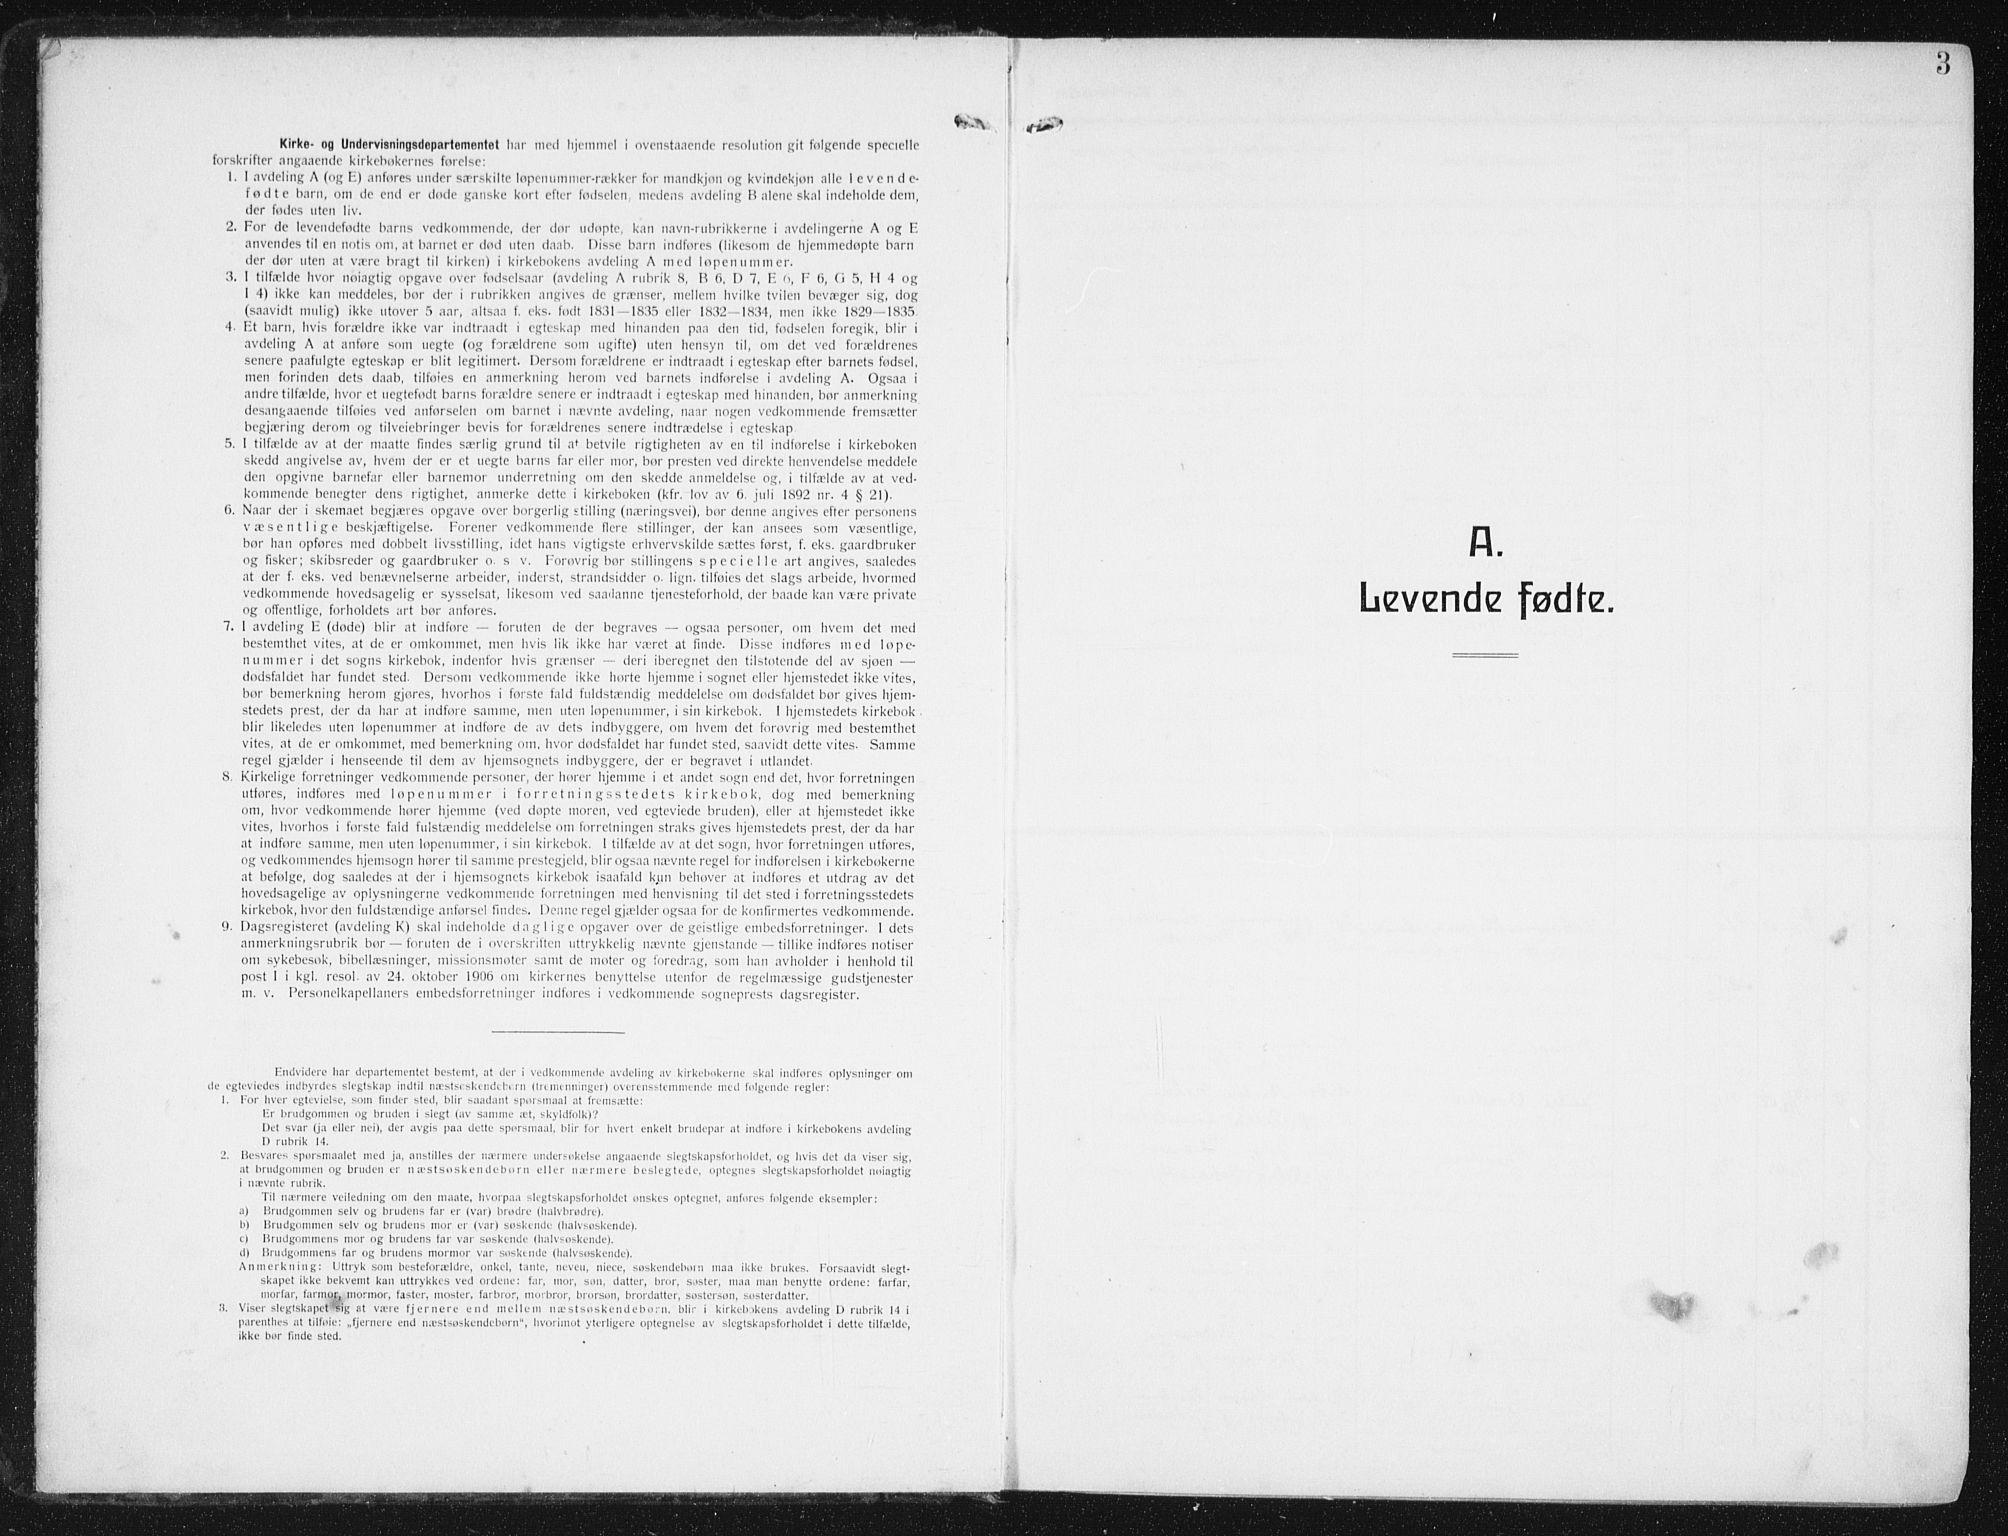 SAT, Ministerialprotokoller, klokkerbøker og fødselsregistre - Nordland, 880/L1135: Ministerialbok nr. 880A09, 1908-1919, s. 3